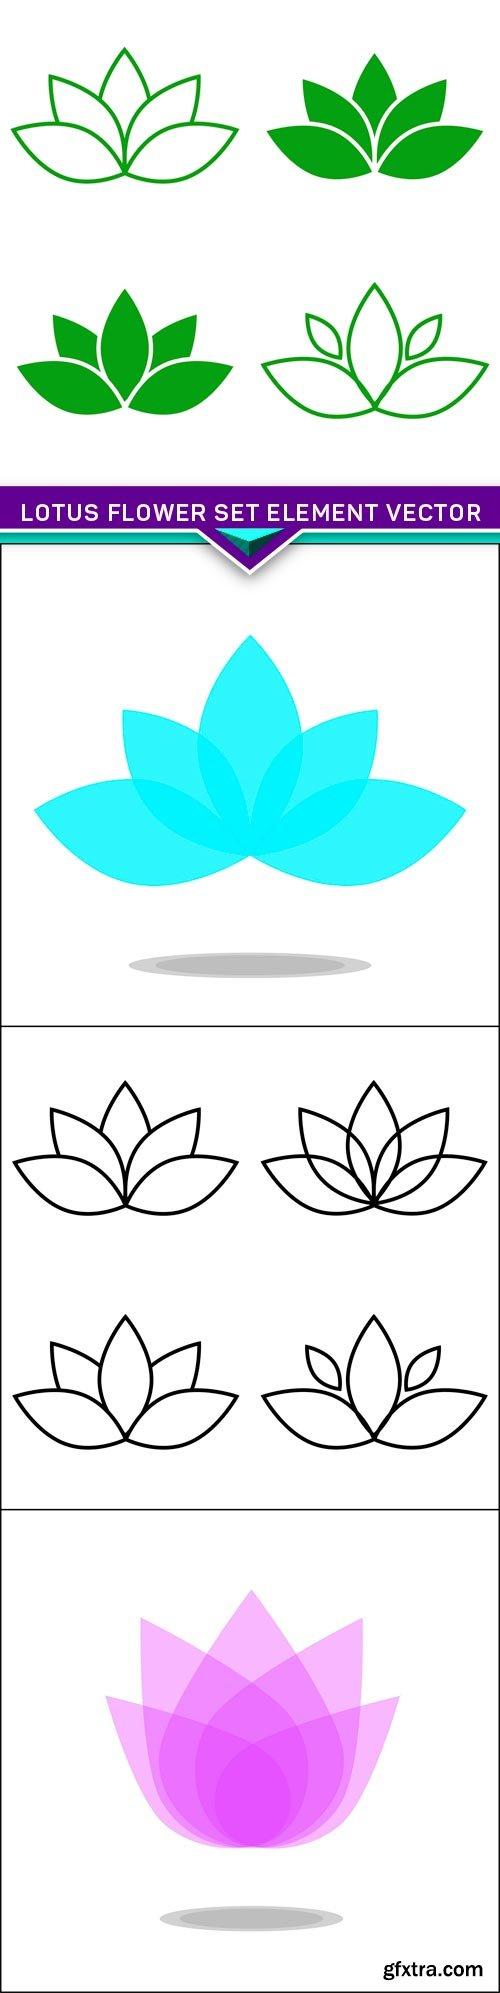 Lotus flower set element vector 4X EPS